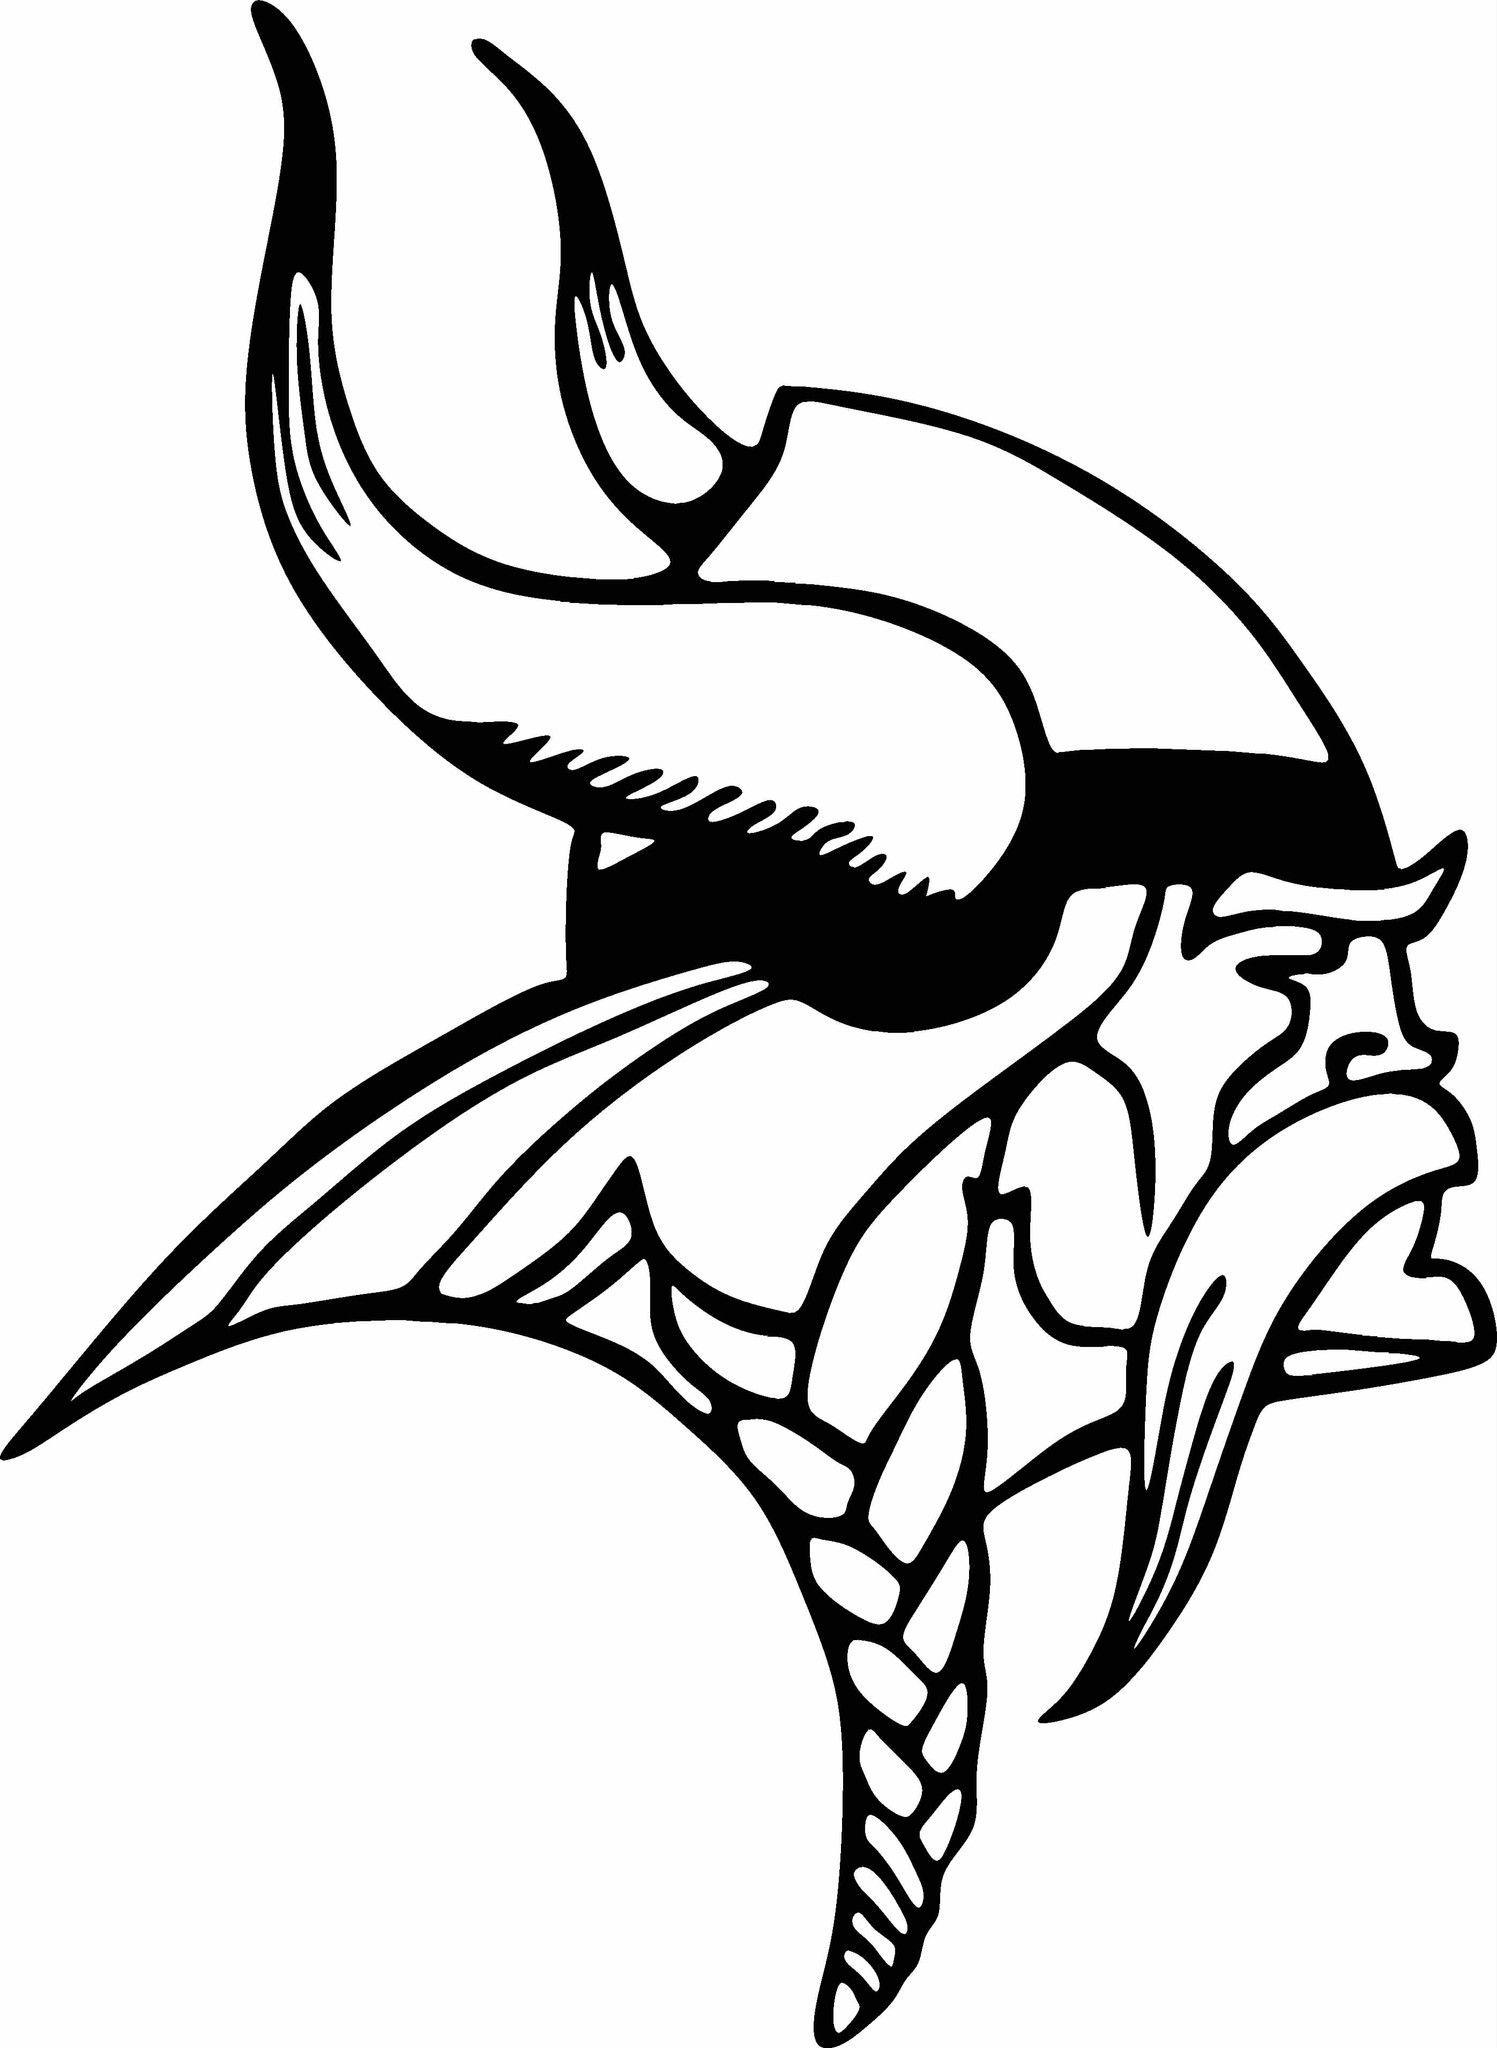 Minnesota Vikings Logo Vinyl Cut Out Decal Choose Your